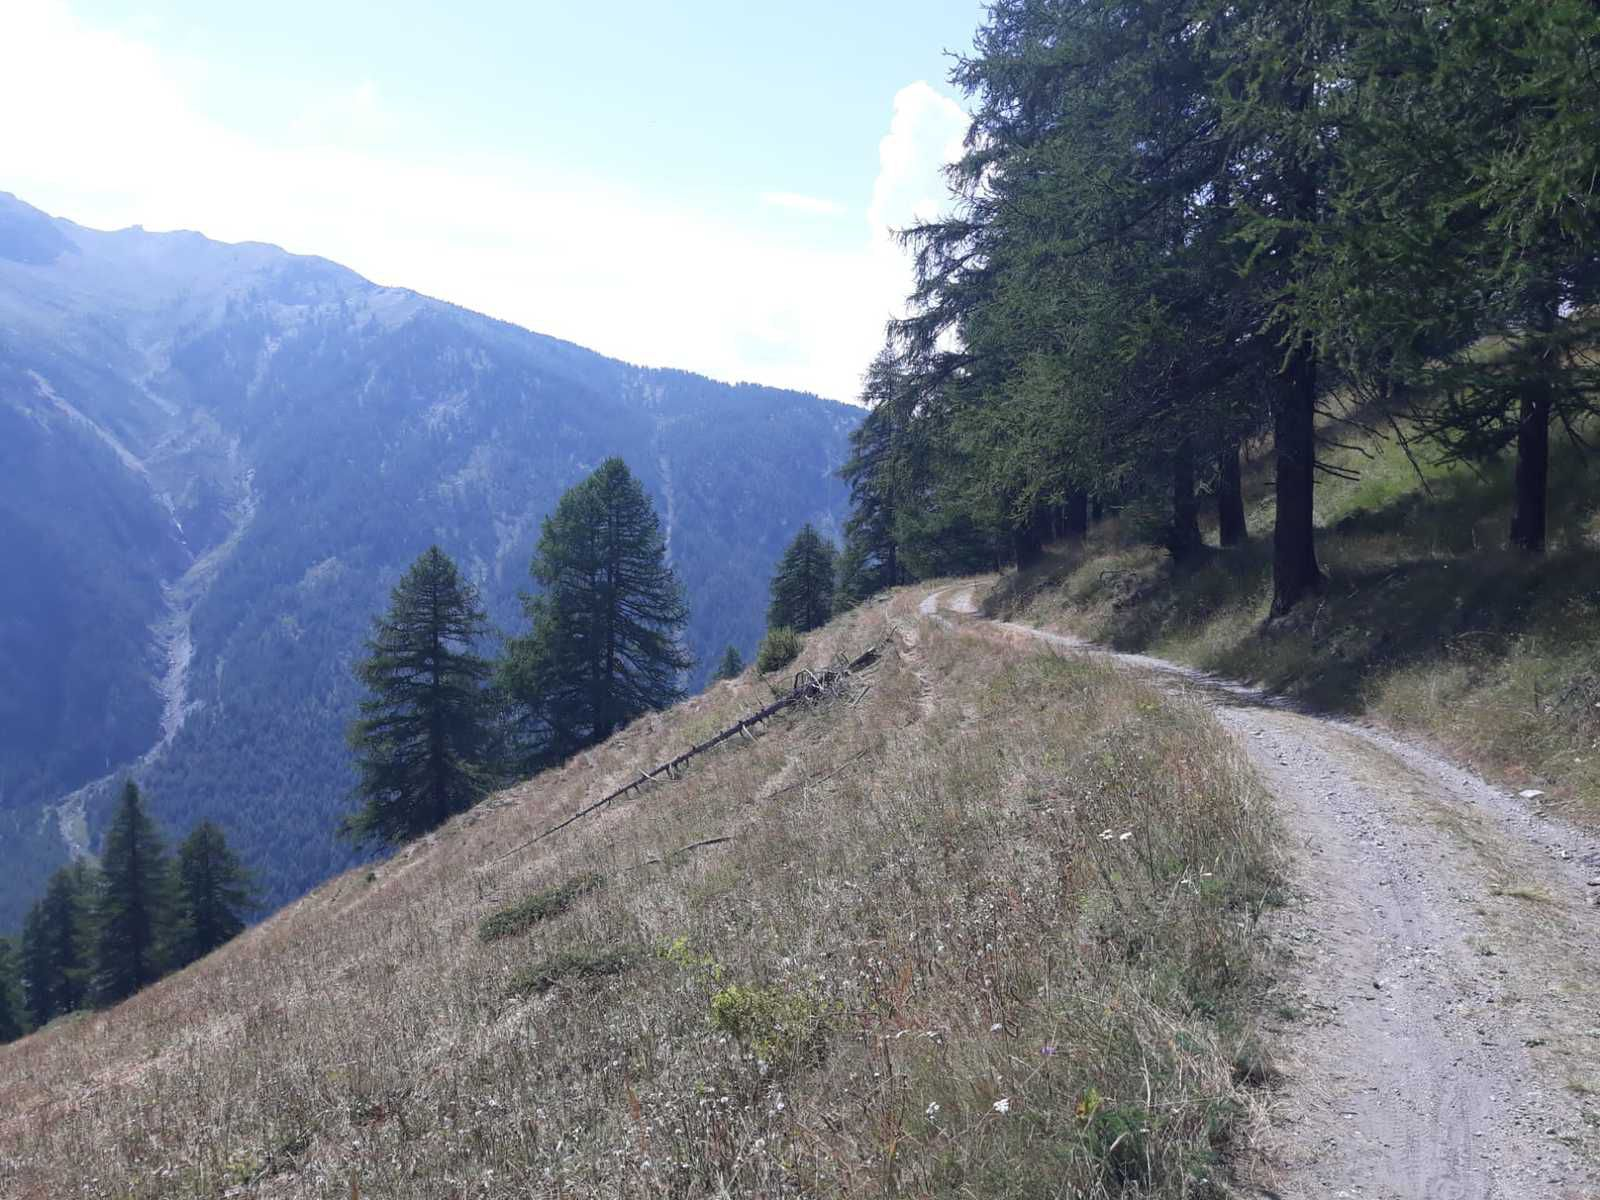 12 aout 2020 - (VTT) Val Troncea, colle Clot della Soma